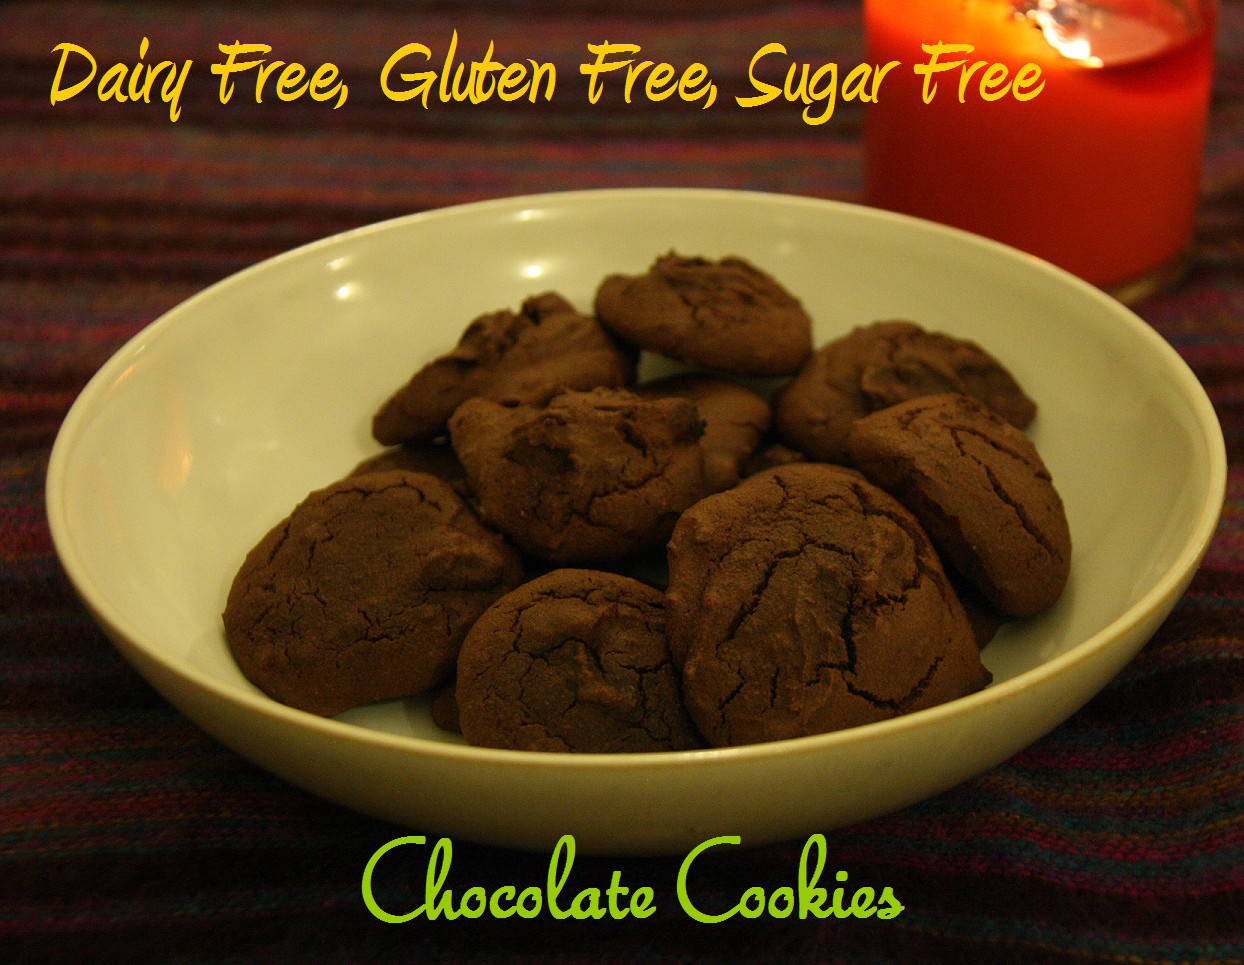 Gluten Free Dairy Free Sugar Free Cookies  AmorExplore Dairy Free Gluten Free Sugar Free Chocolate